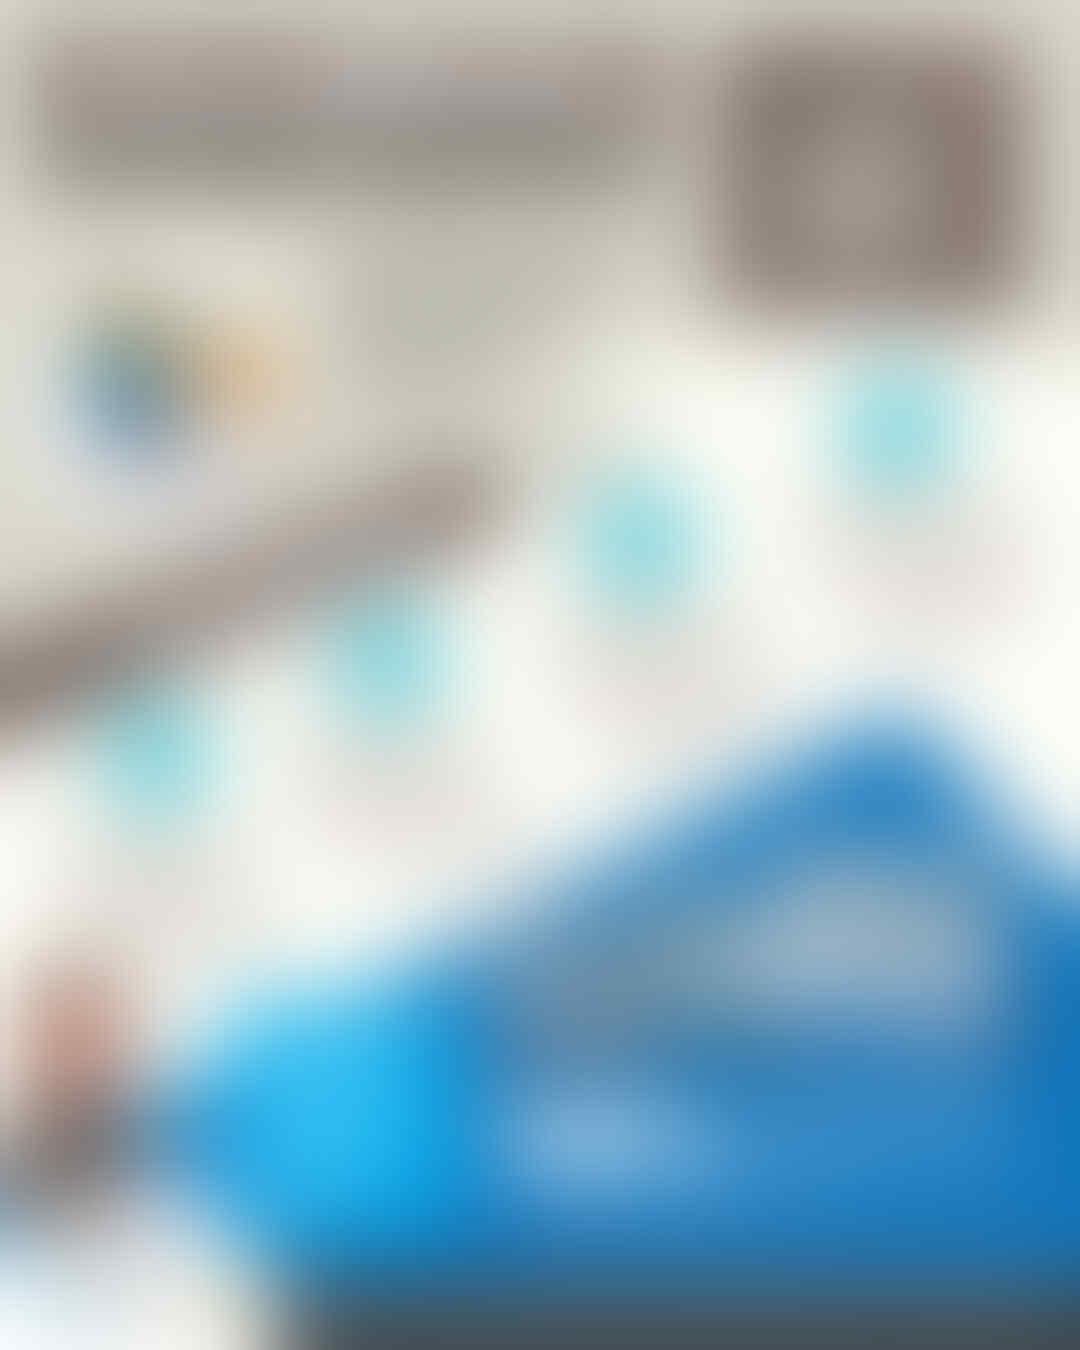 Melonjak Tajam, Jumlah Sekolah dan Siswa yang Ikut UNBK 2018